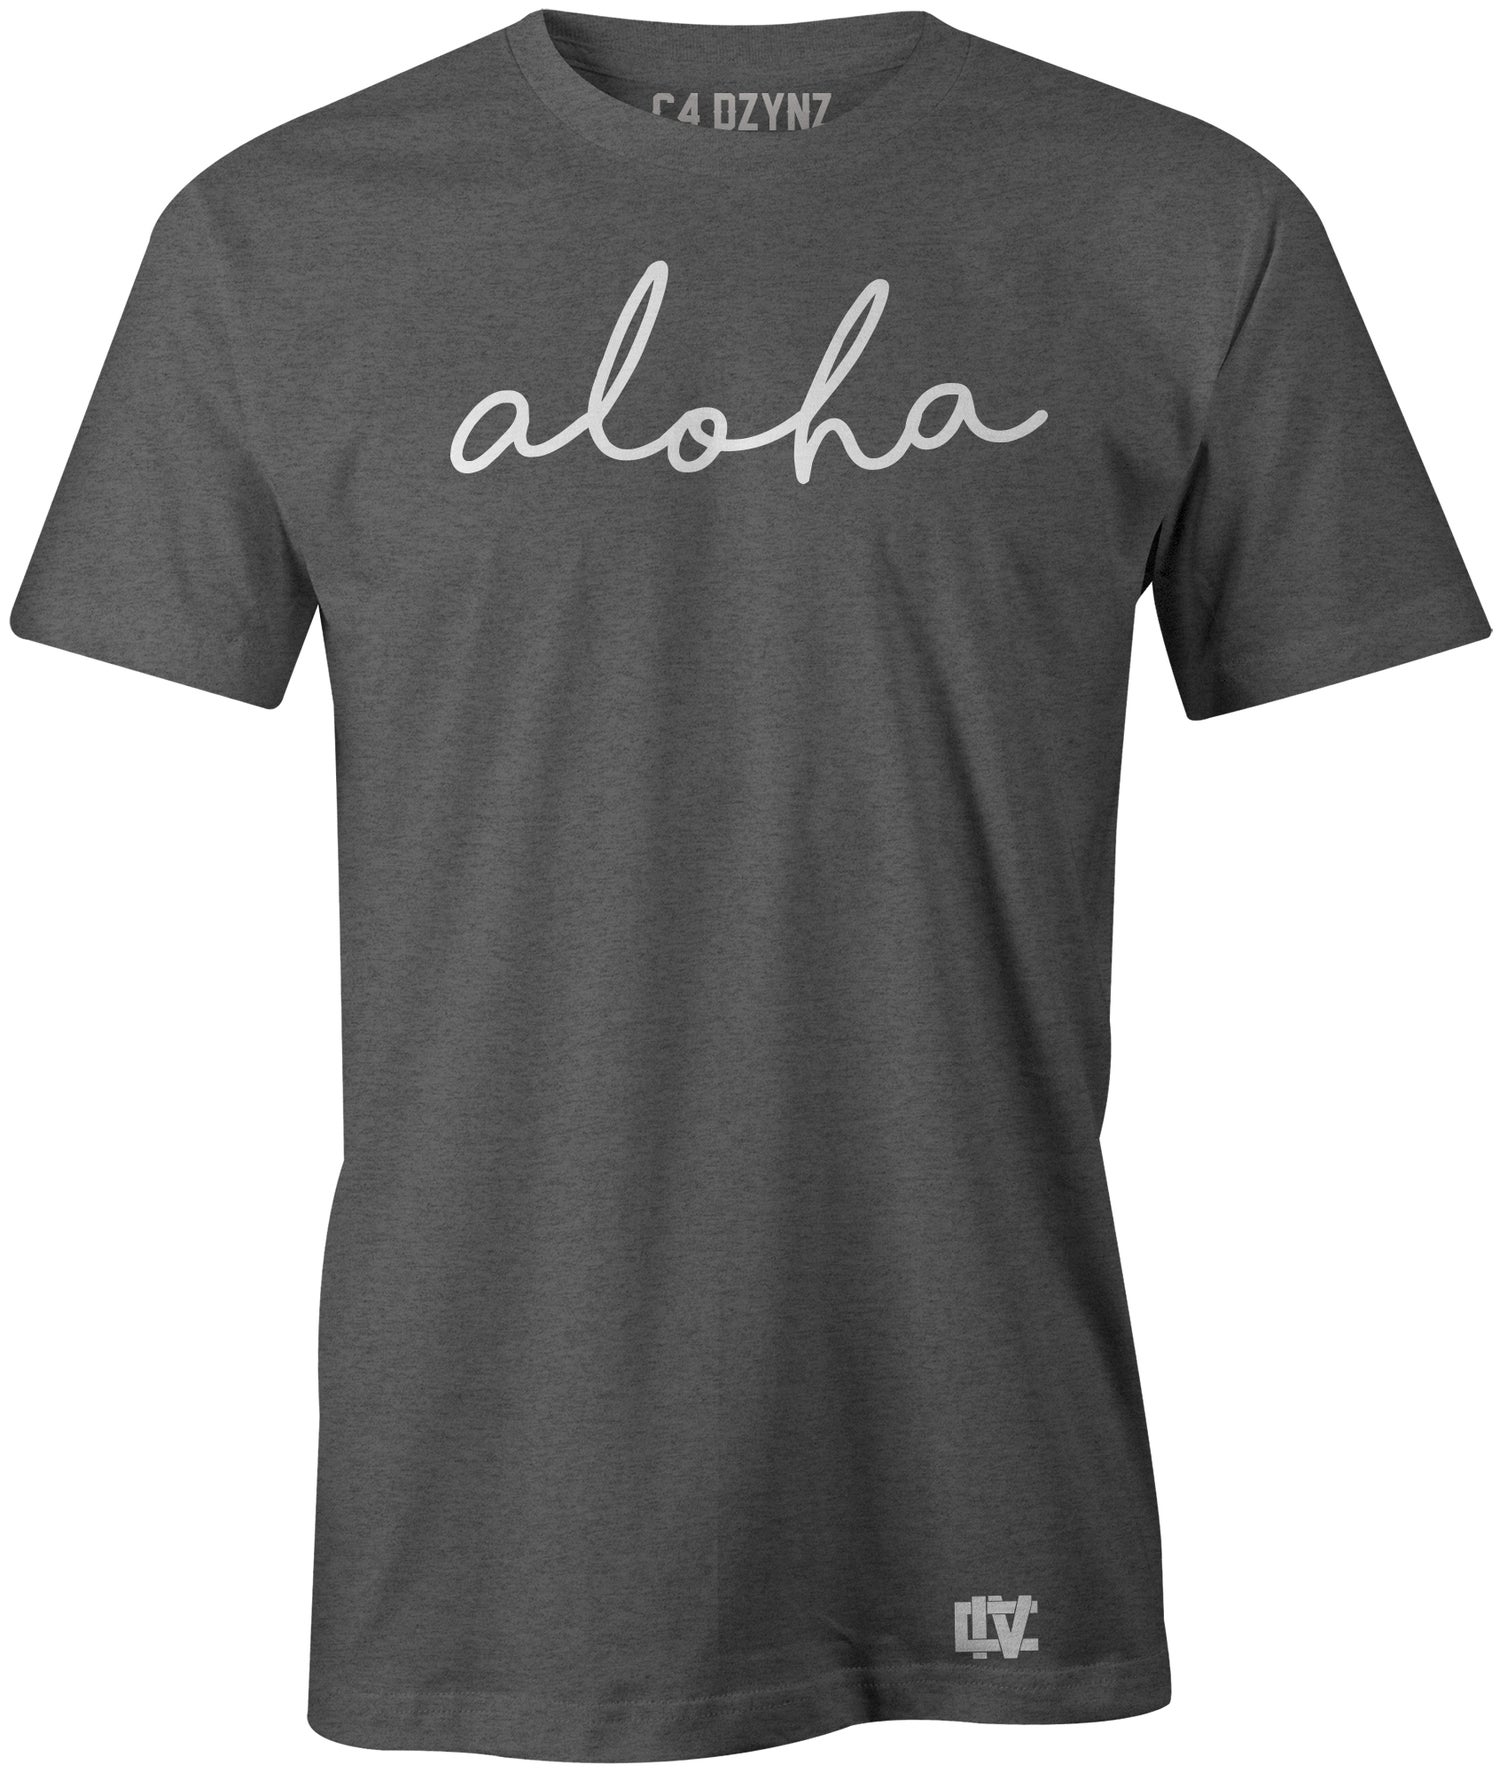 Image of Aloha Script One